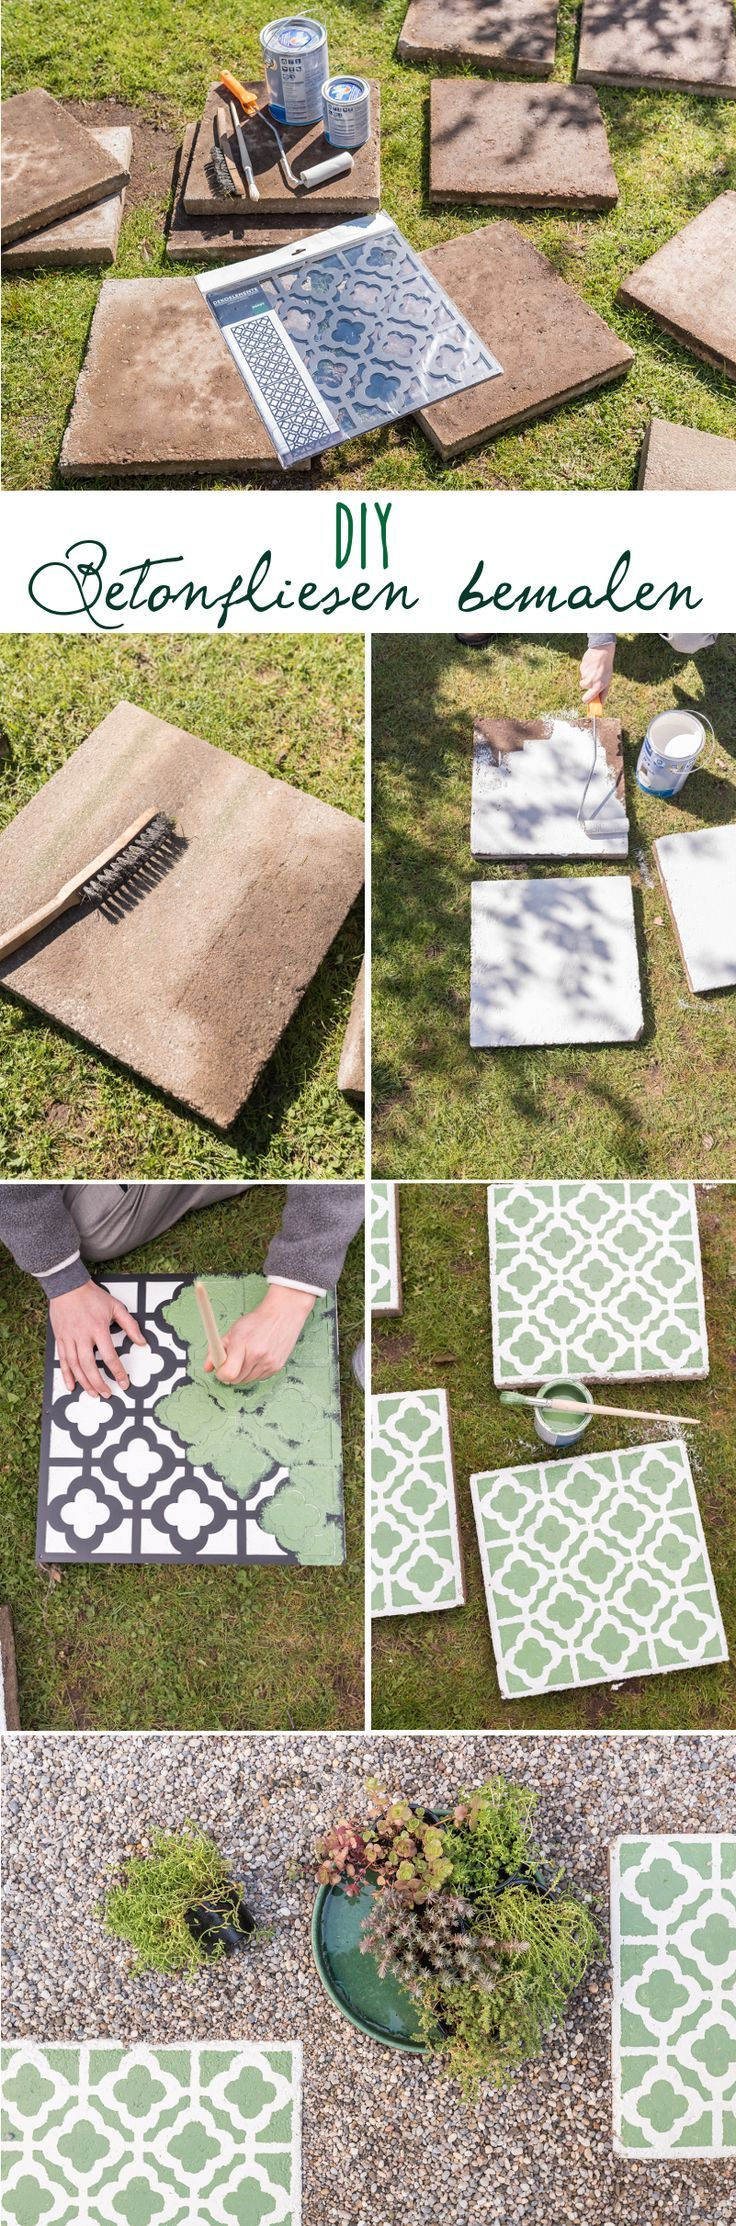 Upcycling Garten diy betonplatten upcycling für den garten gardens upcycling and